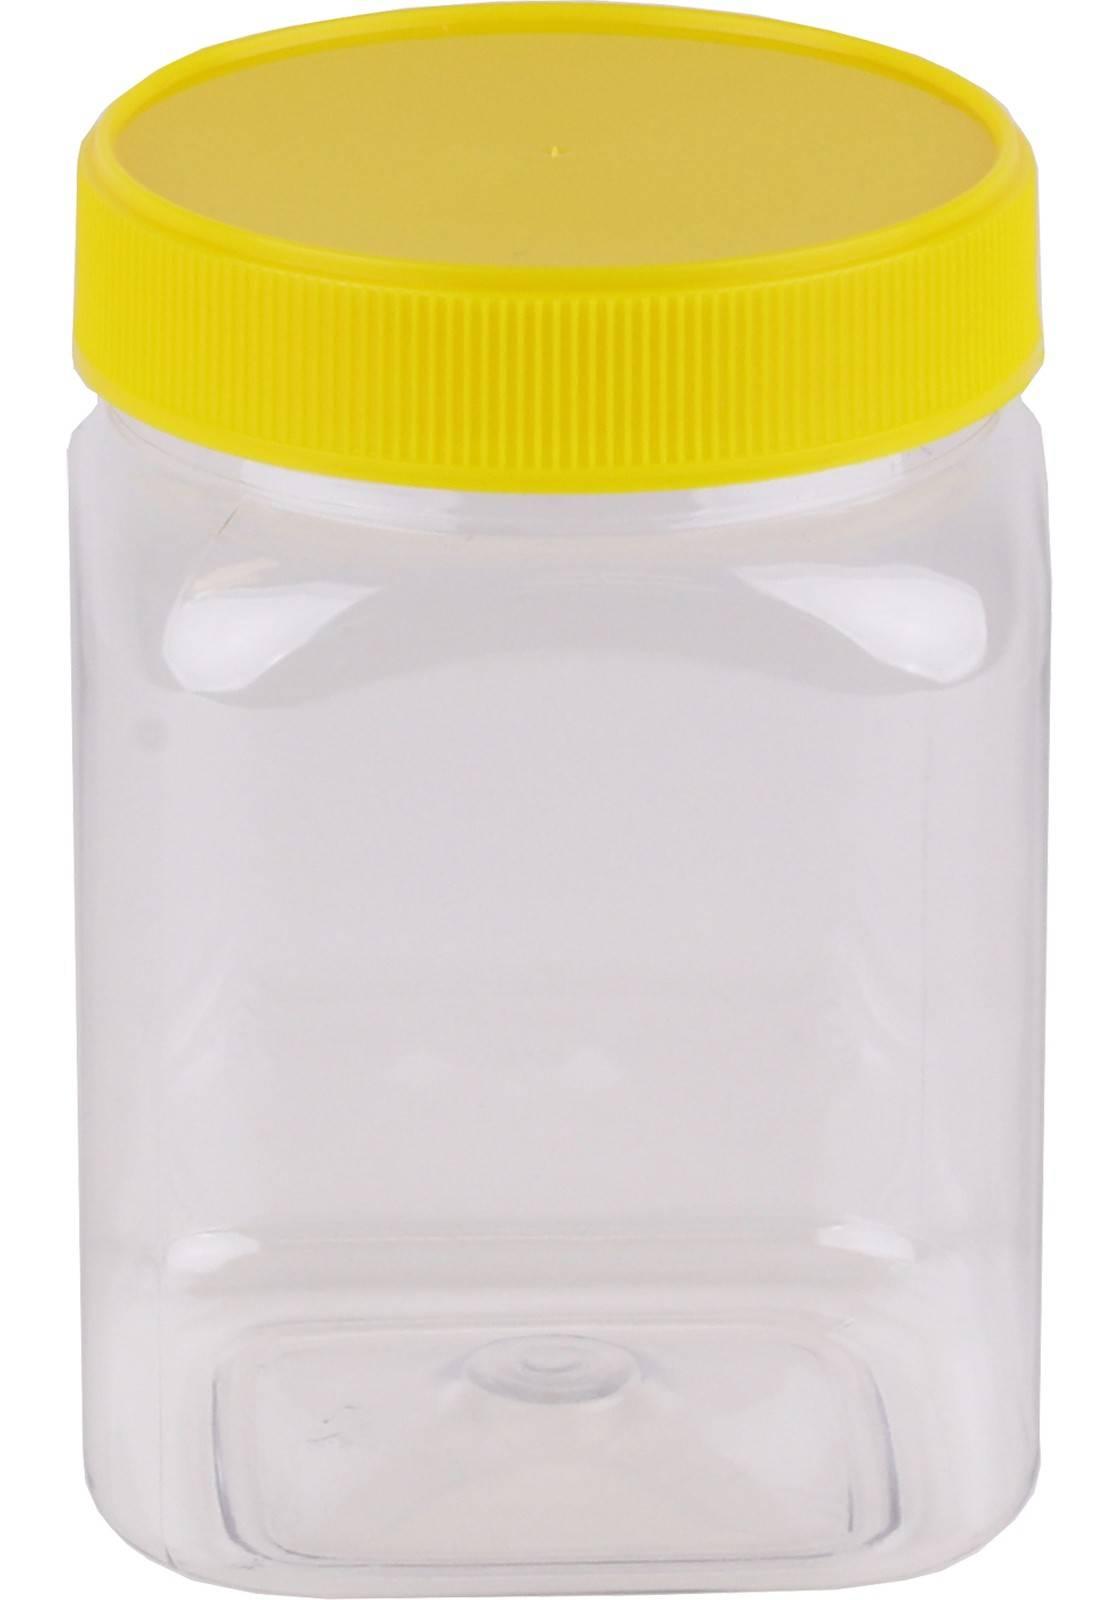 Carton of 120pc Honey Jars - 1kg size - Square Yellow Lid